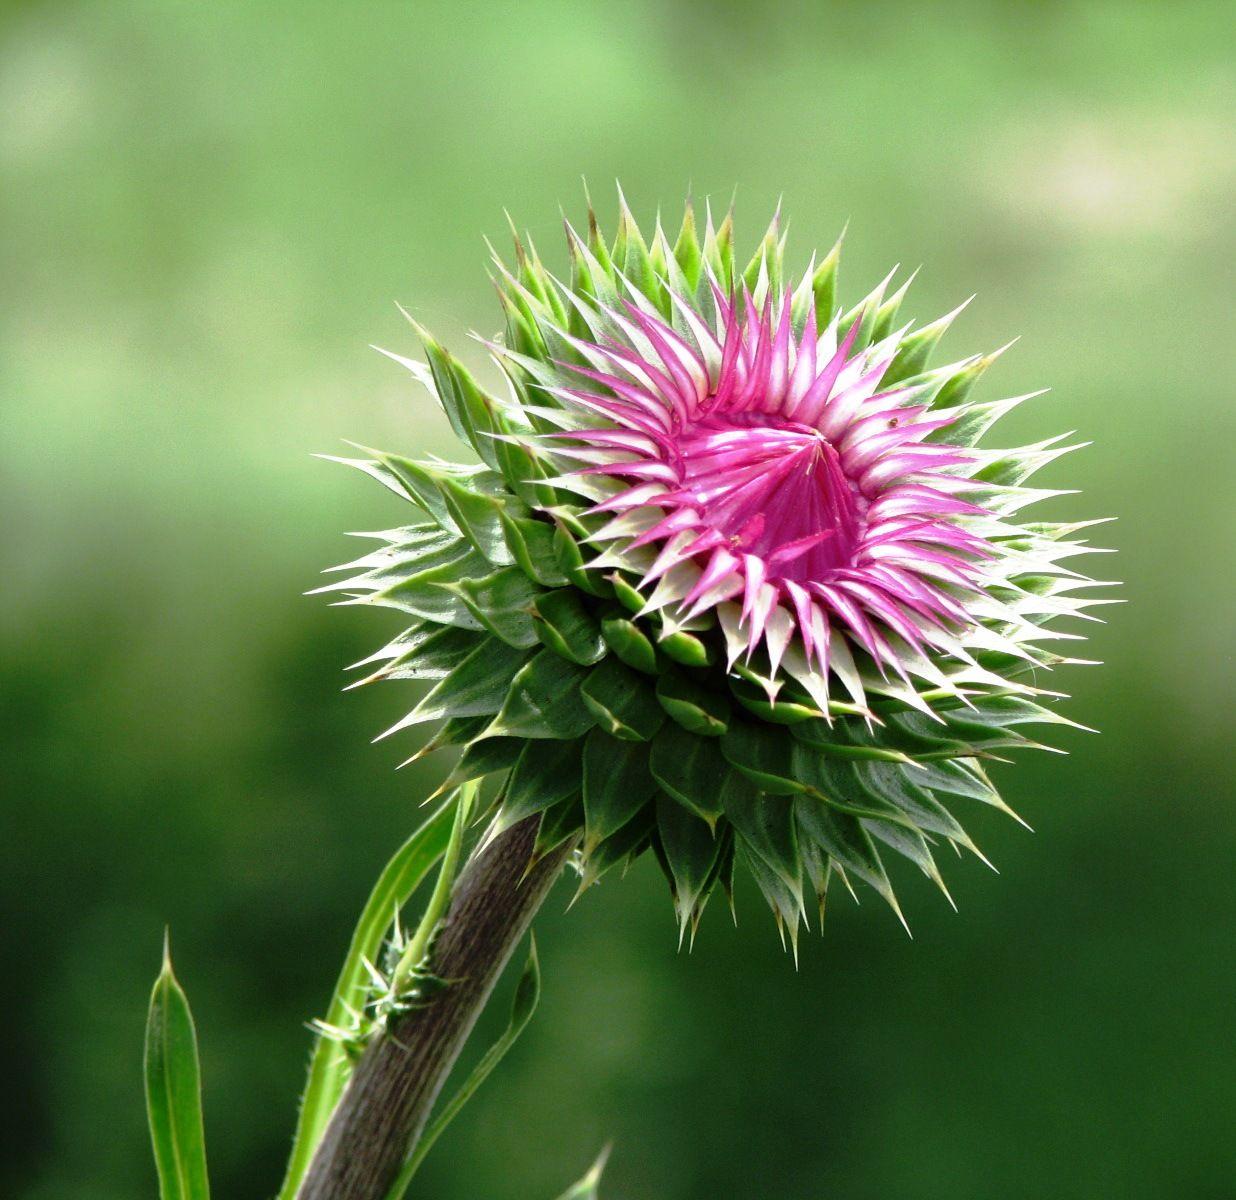 Thistle Scotland national flower, Flower beauty, Flowers